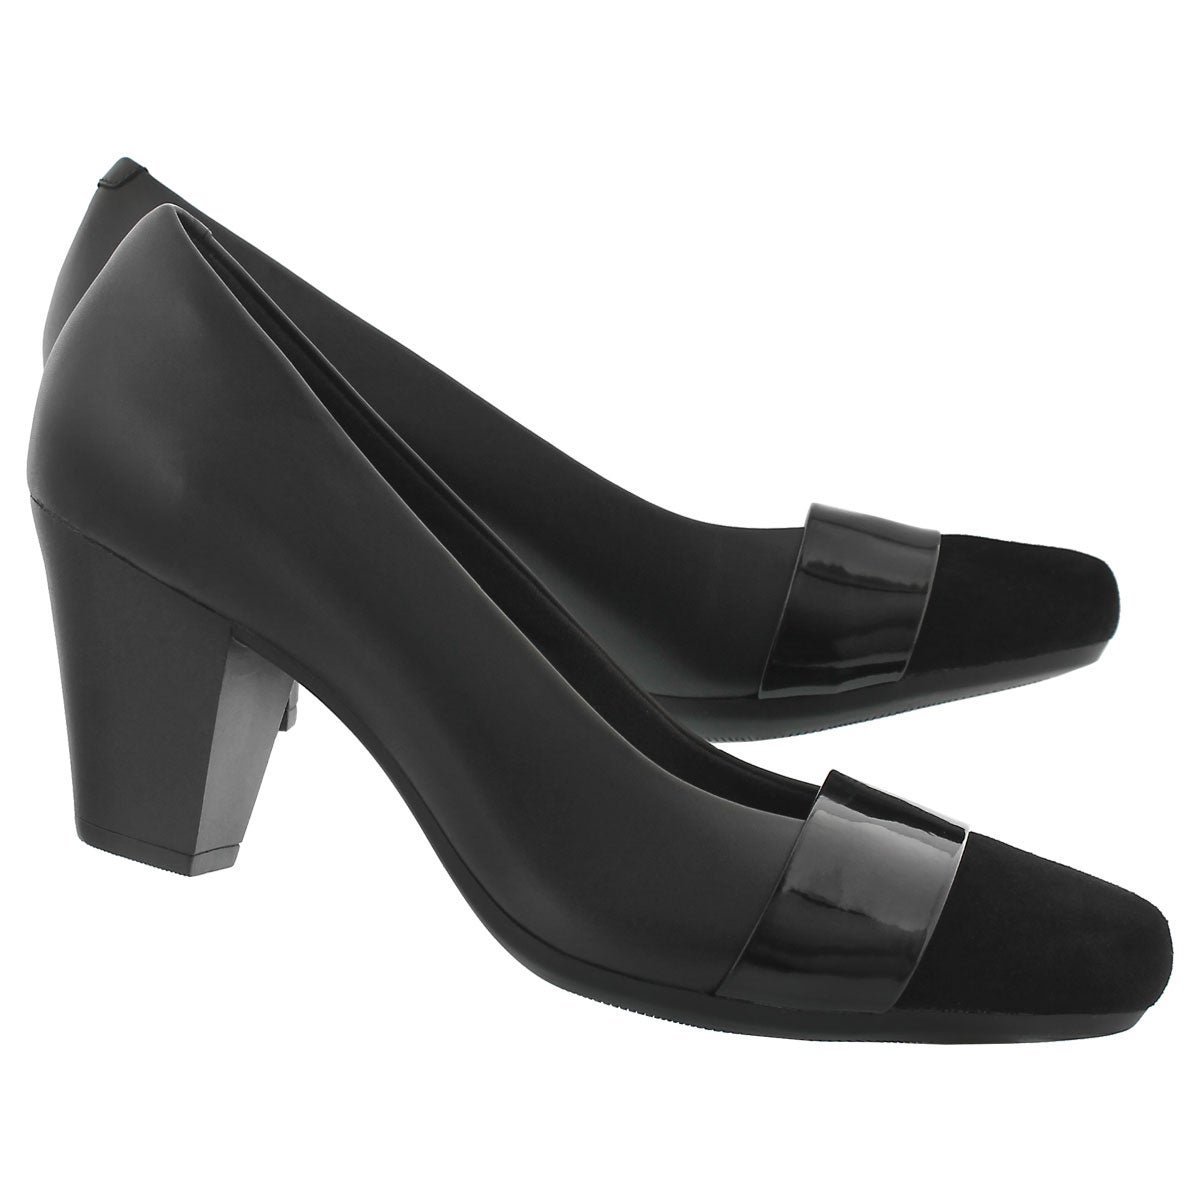 Lds Garnit Lucia black dress heel